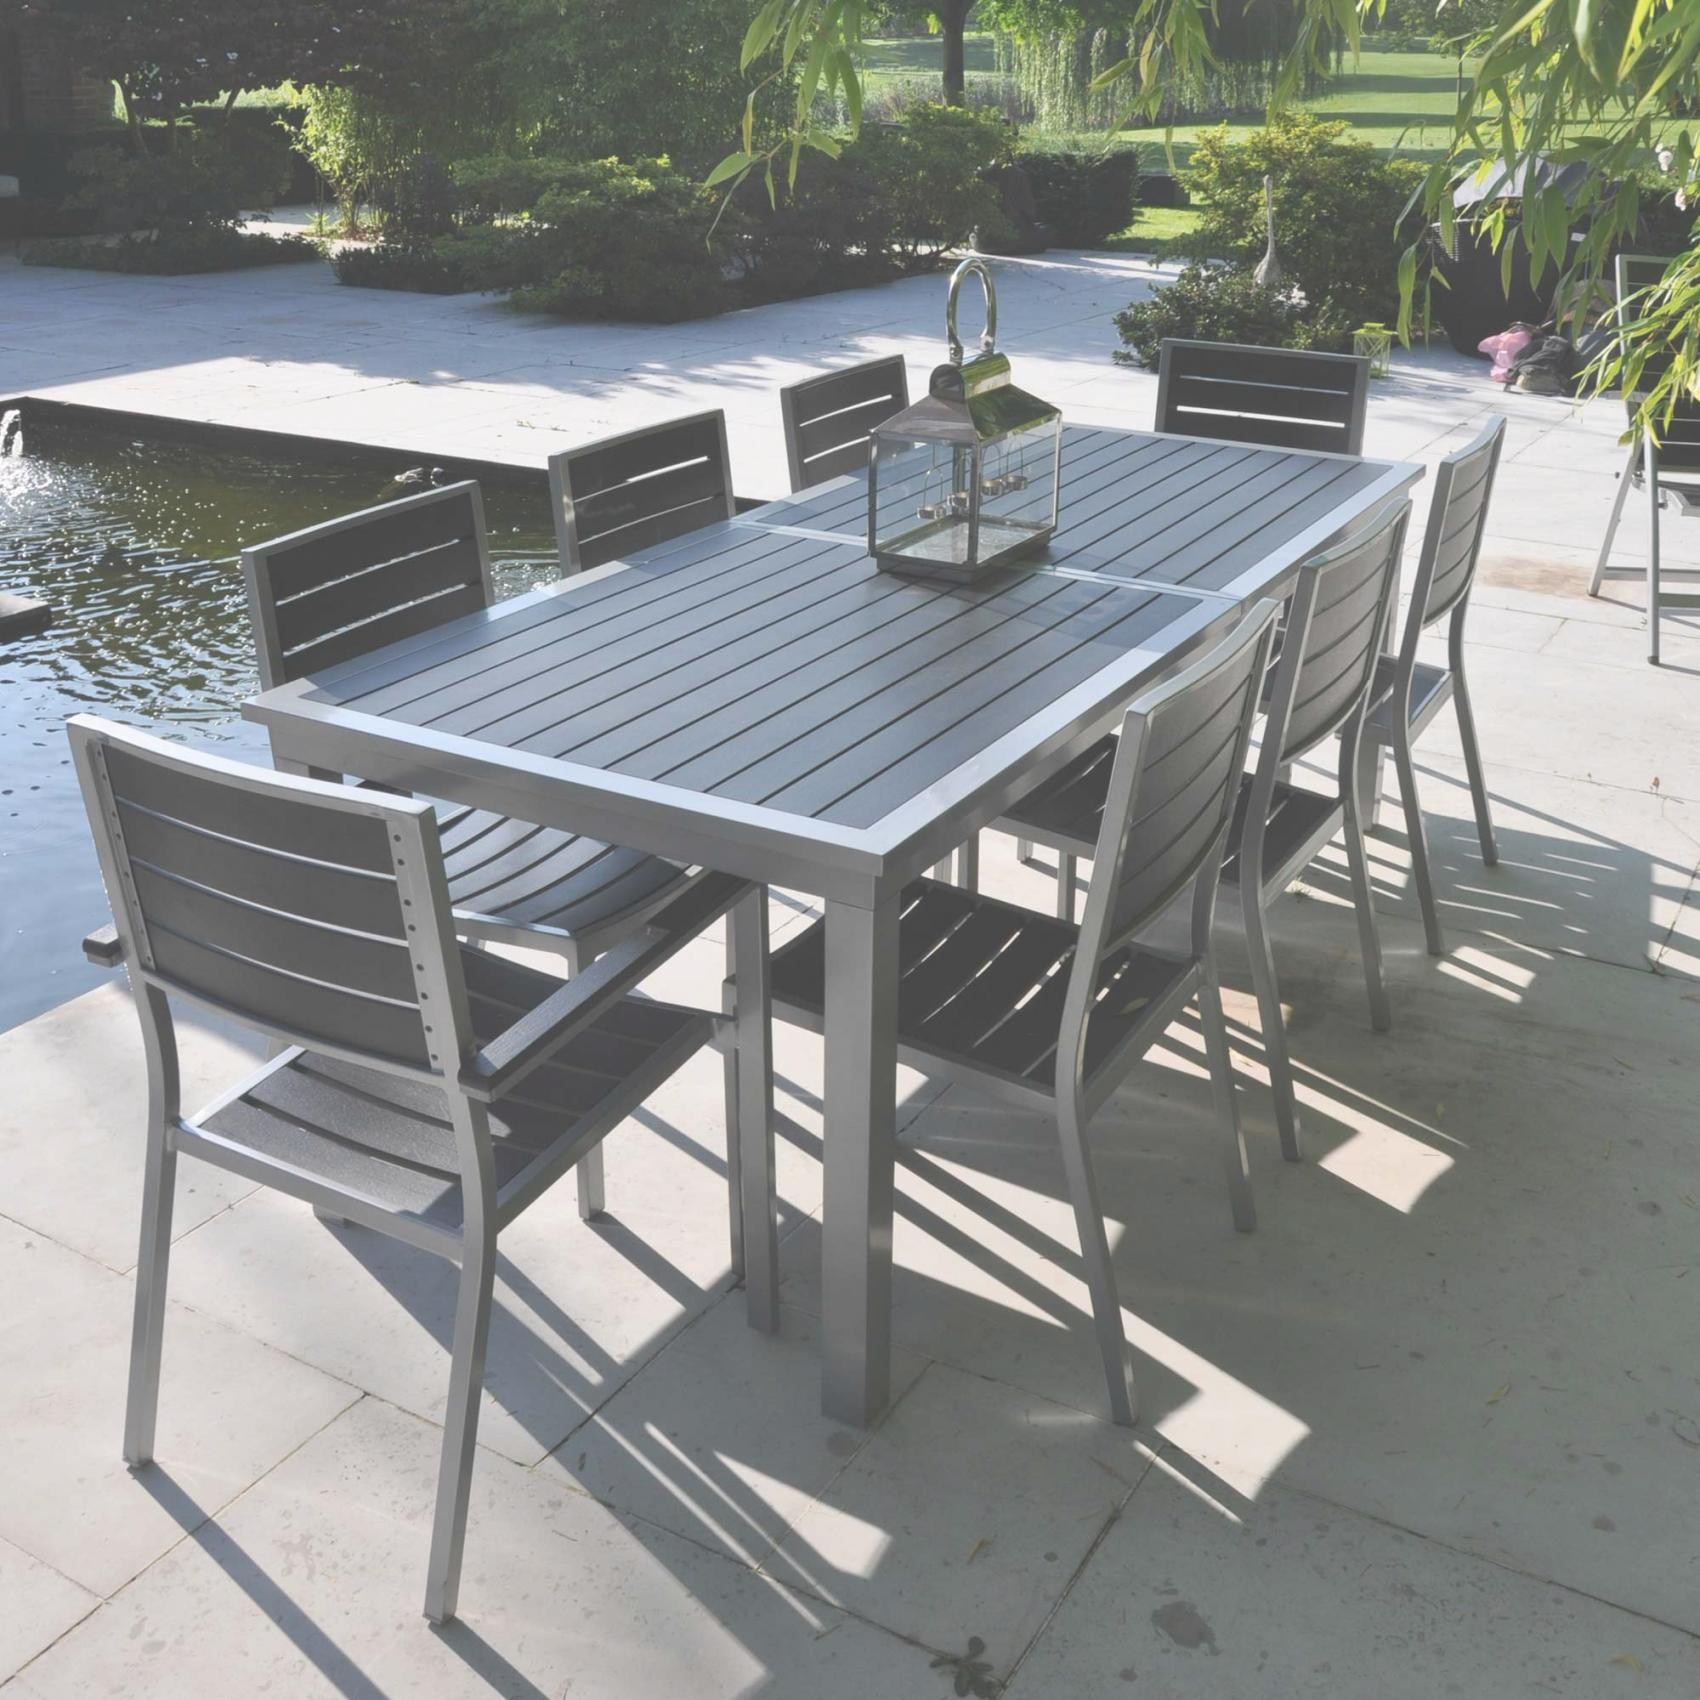 Chaise de jardin groupon - veranda-styledevie.fr